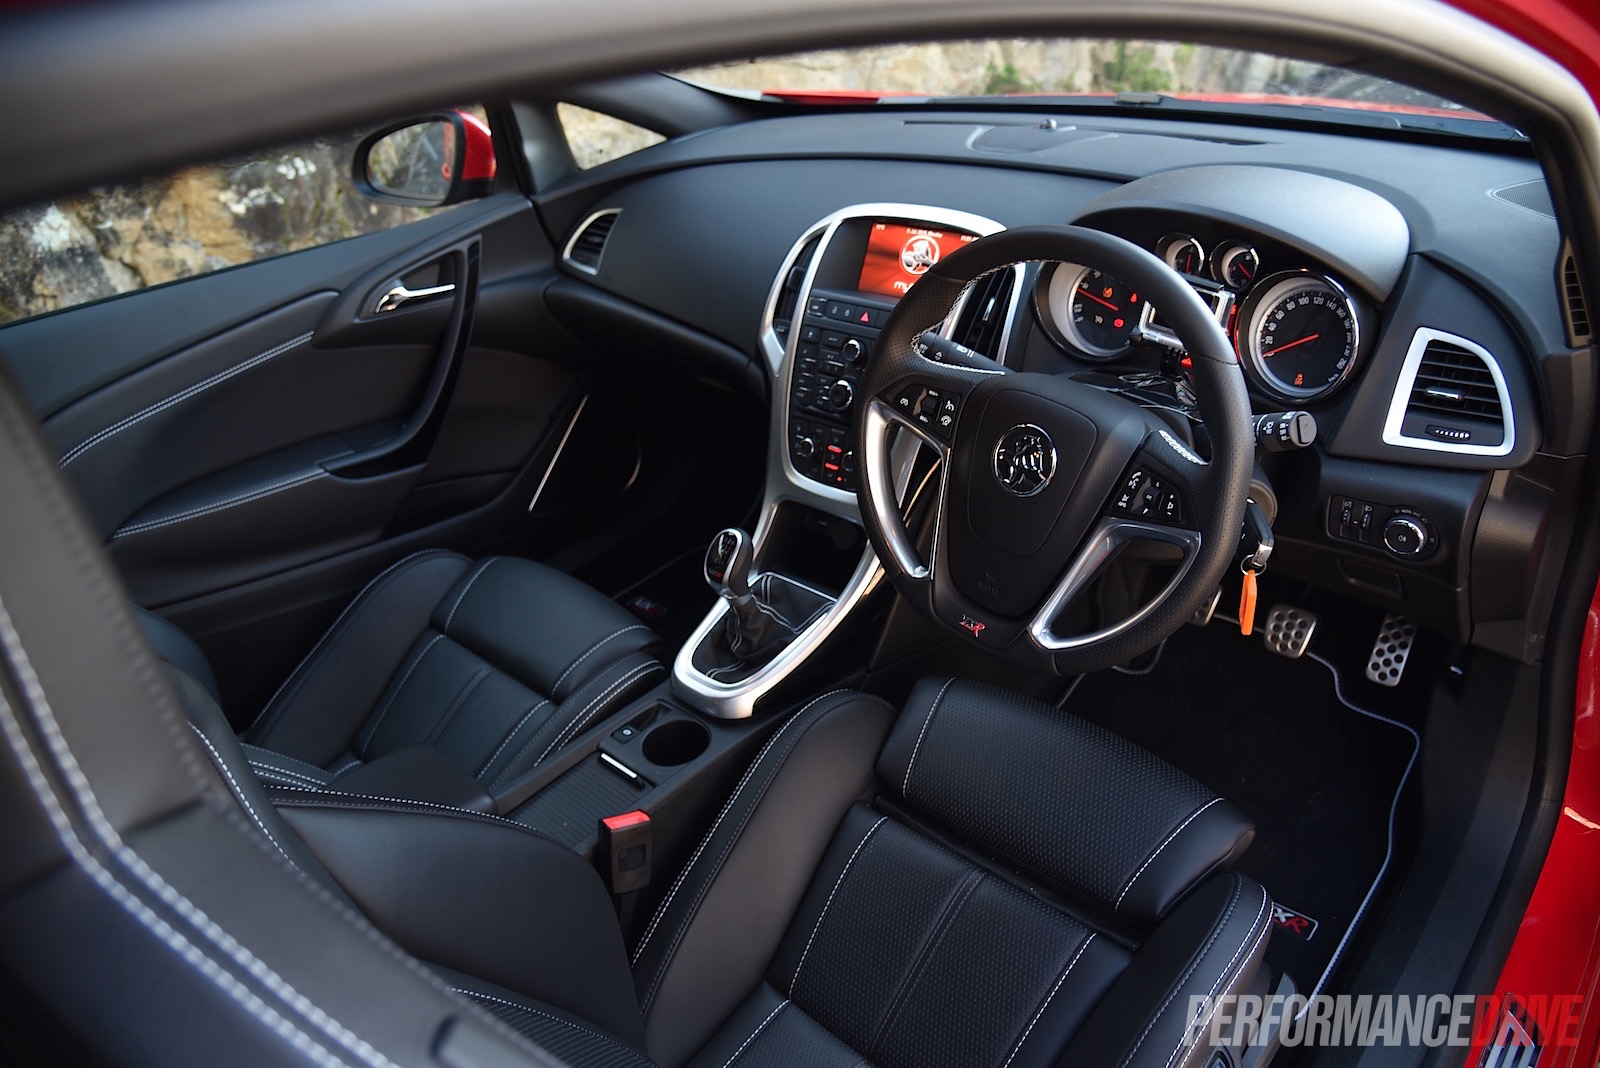 2015 Holden Astra VXR review (video) | PerformanceDrive  Vauxhall Astra Vxr Interior